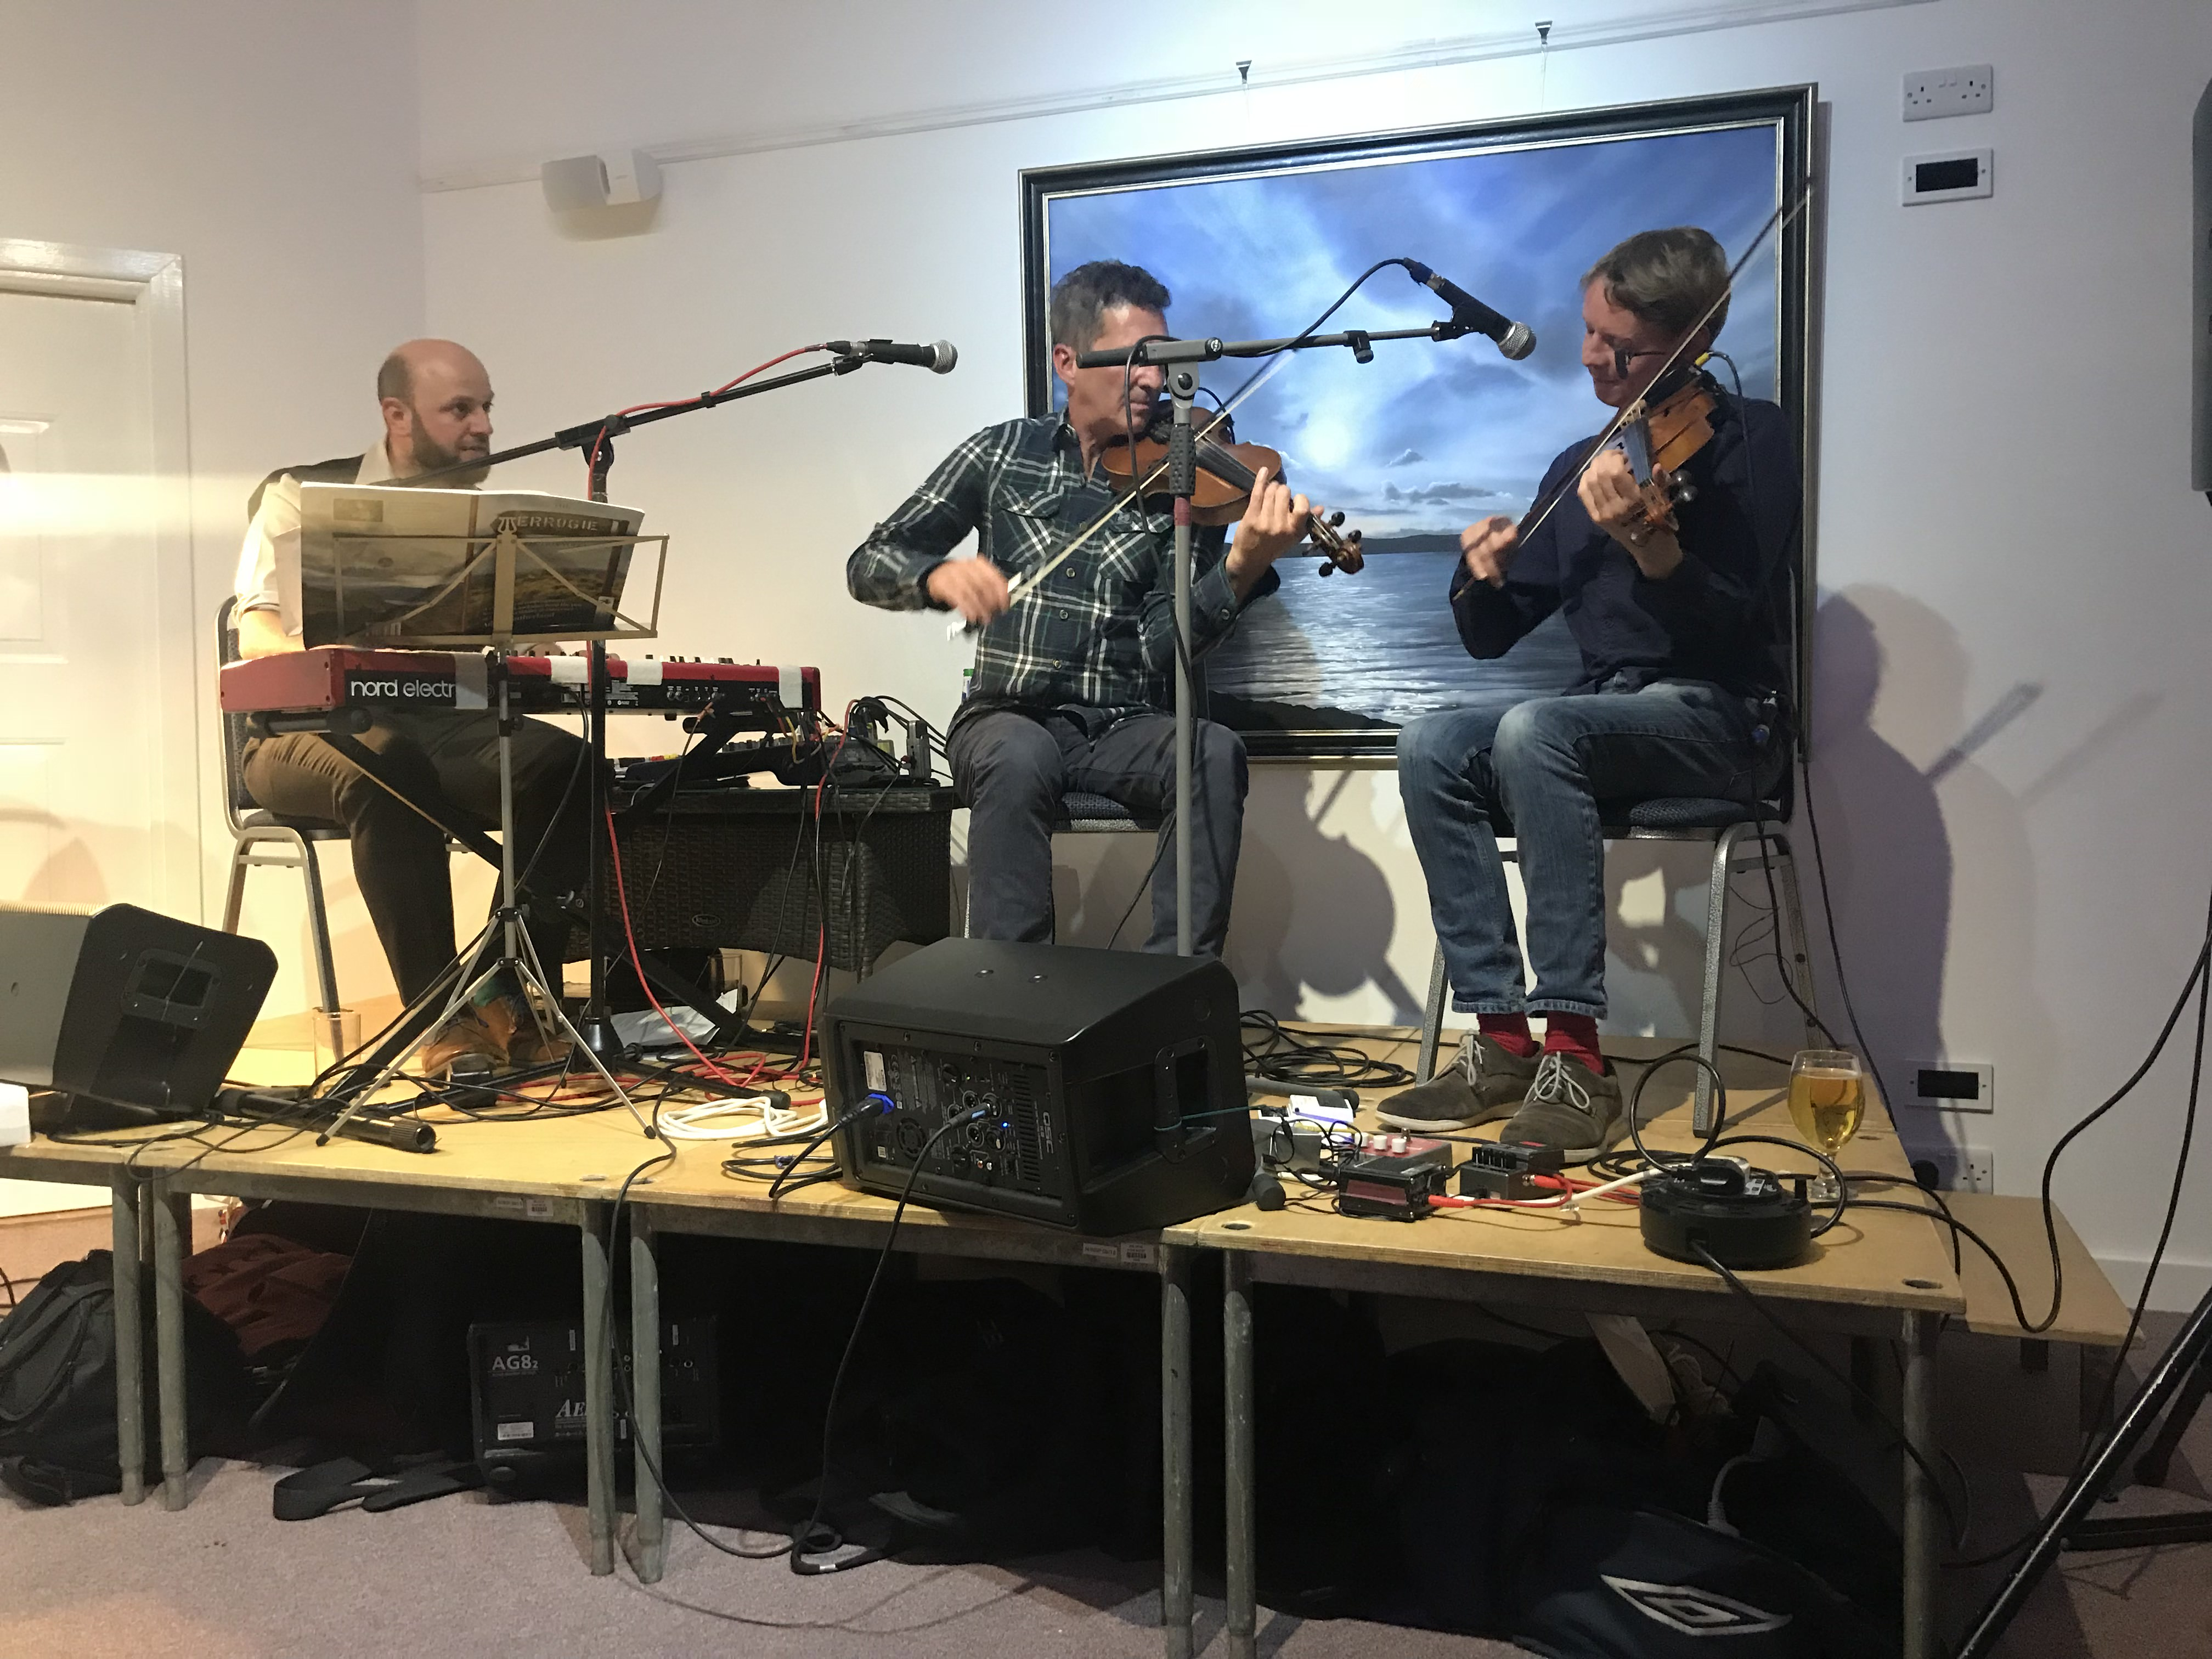 Local musicians playing Scottish music